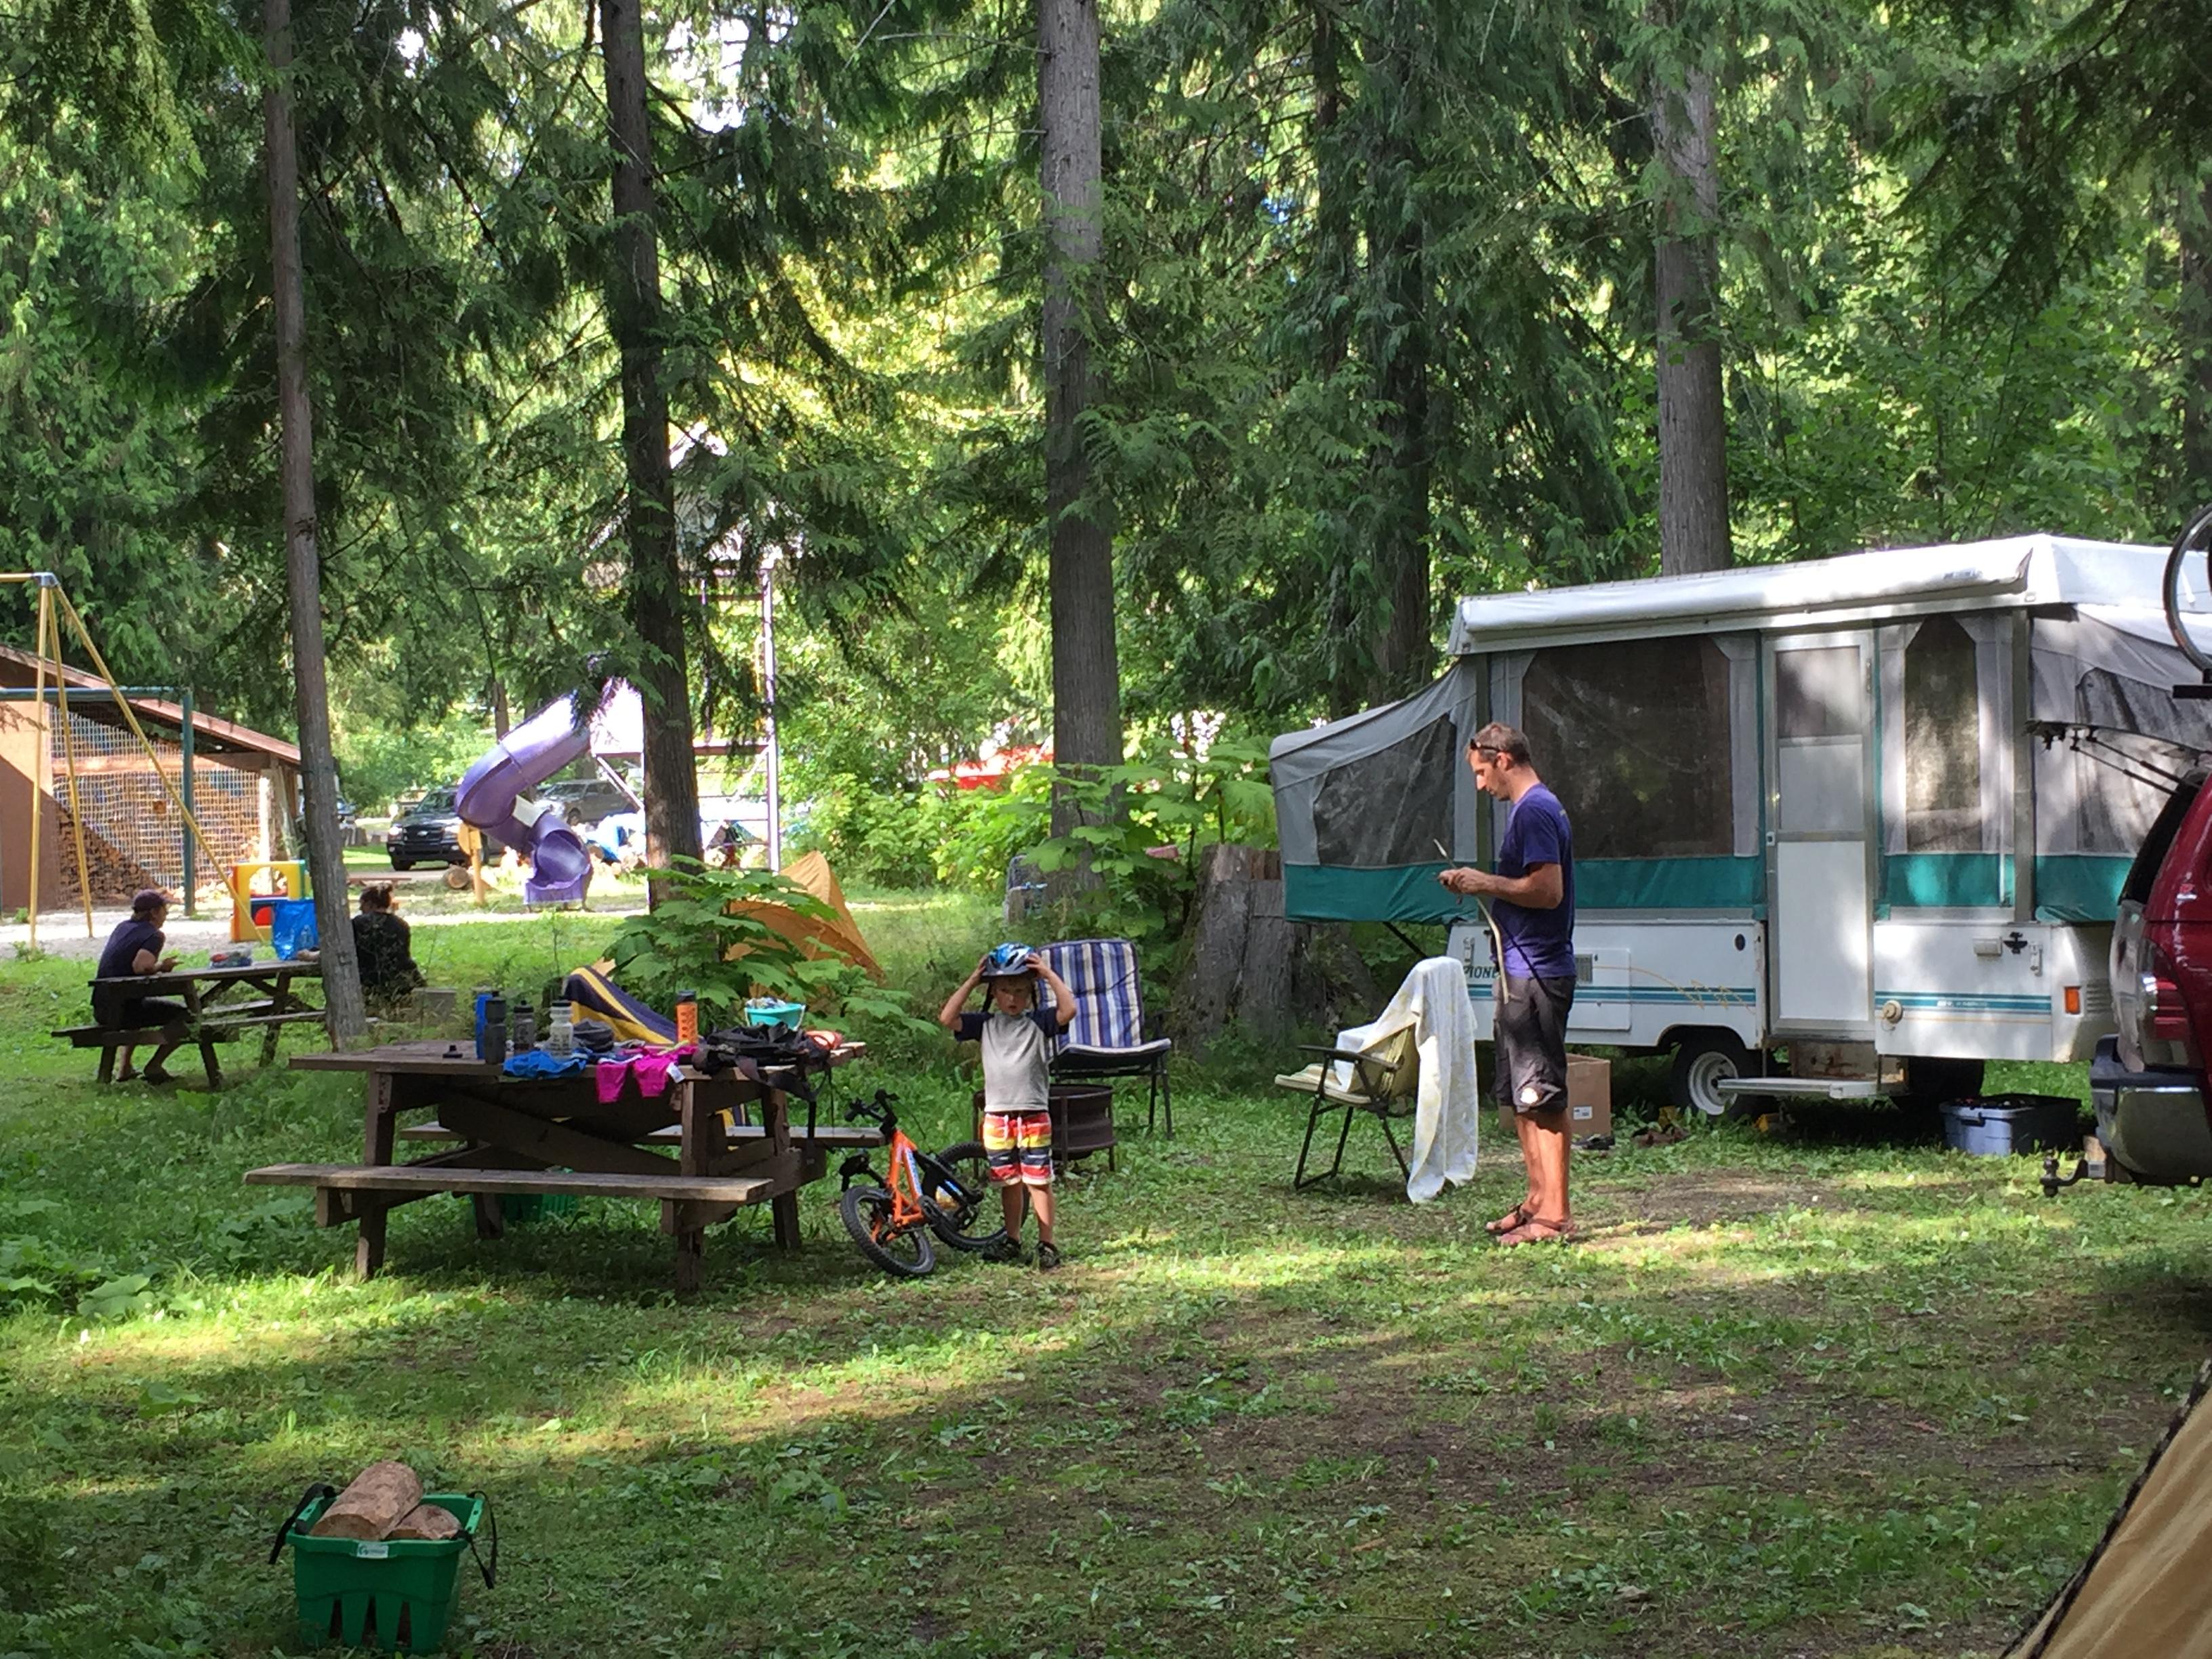 Family enjoying campground